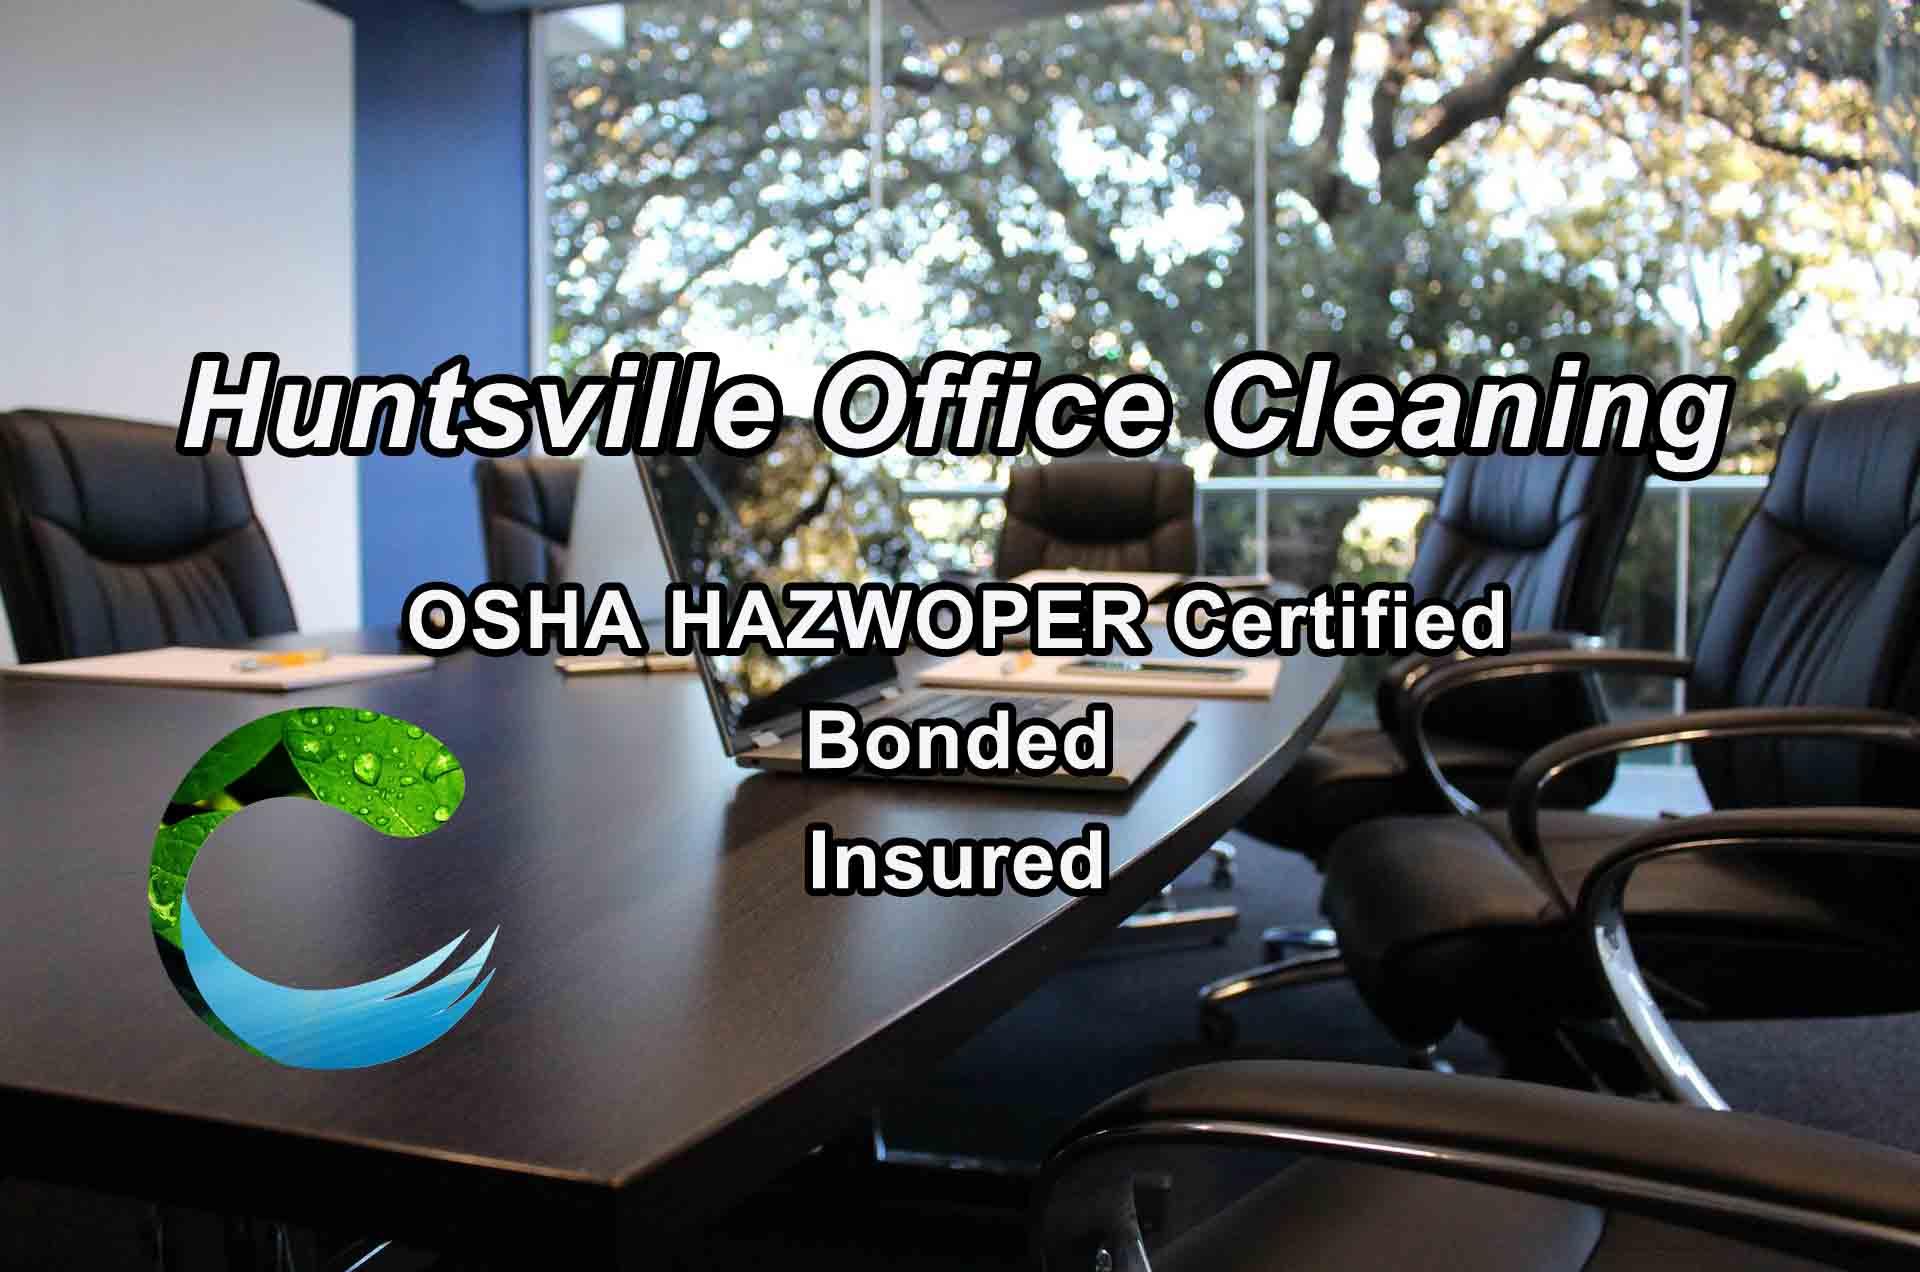 Huntsville Office Cleaning